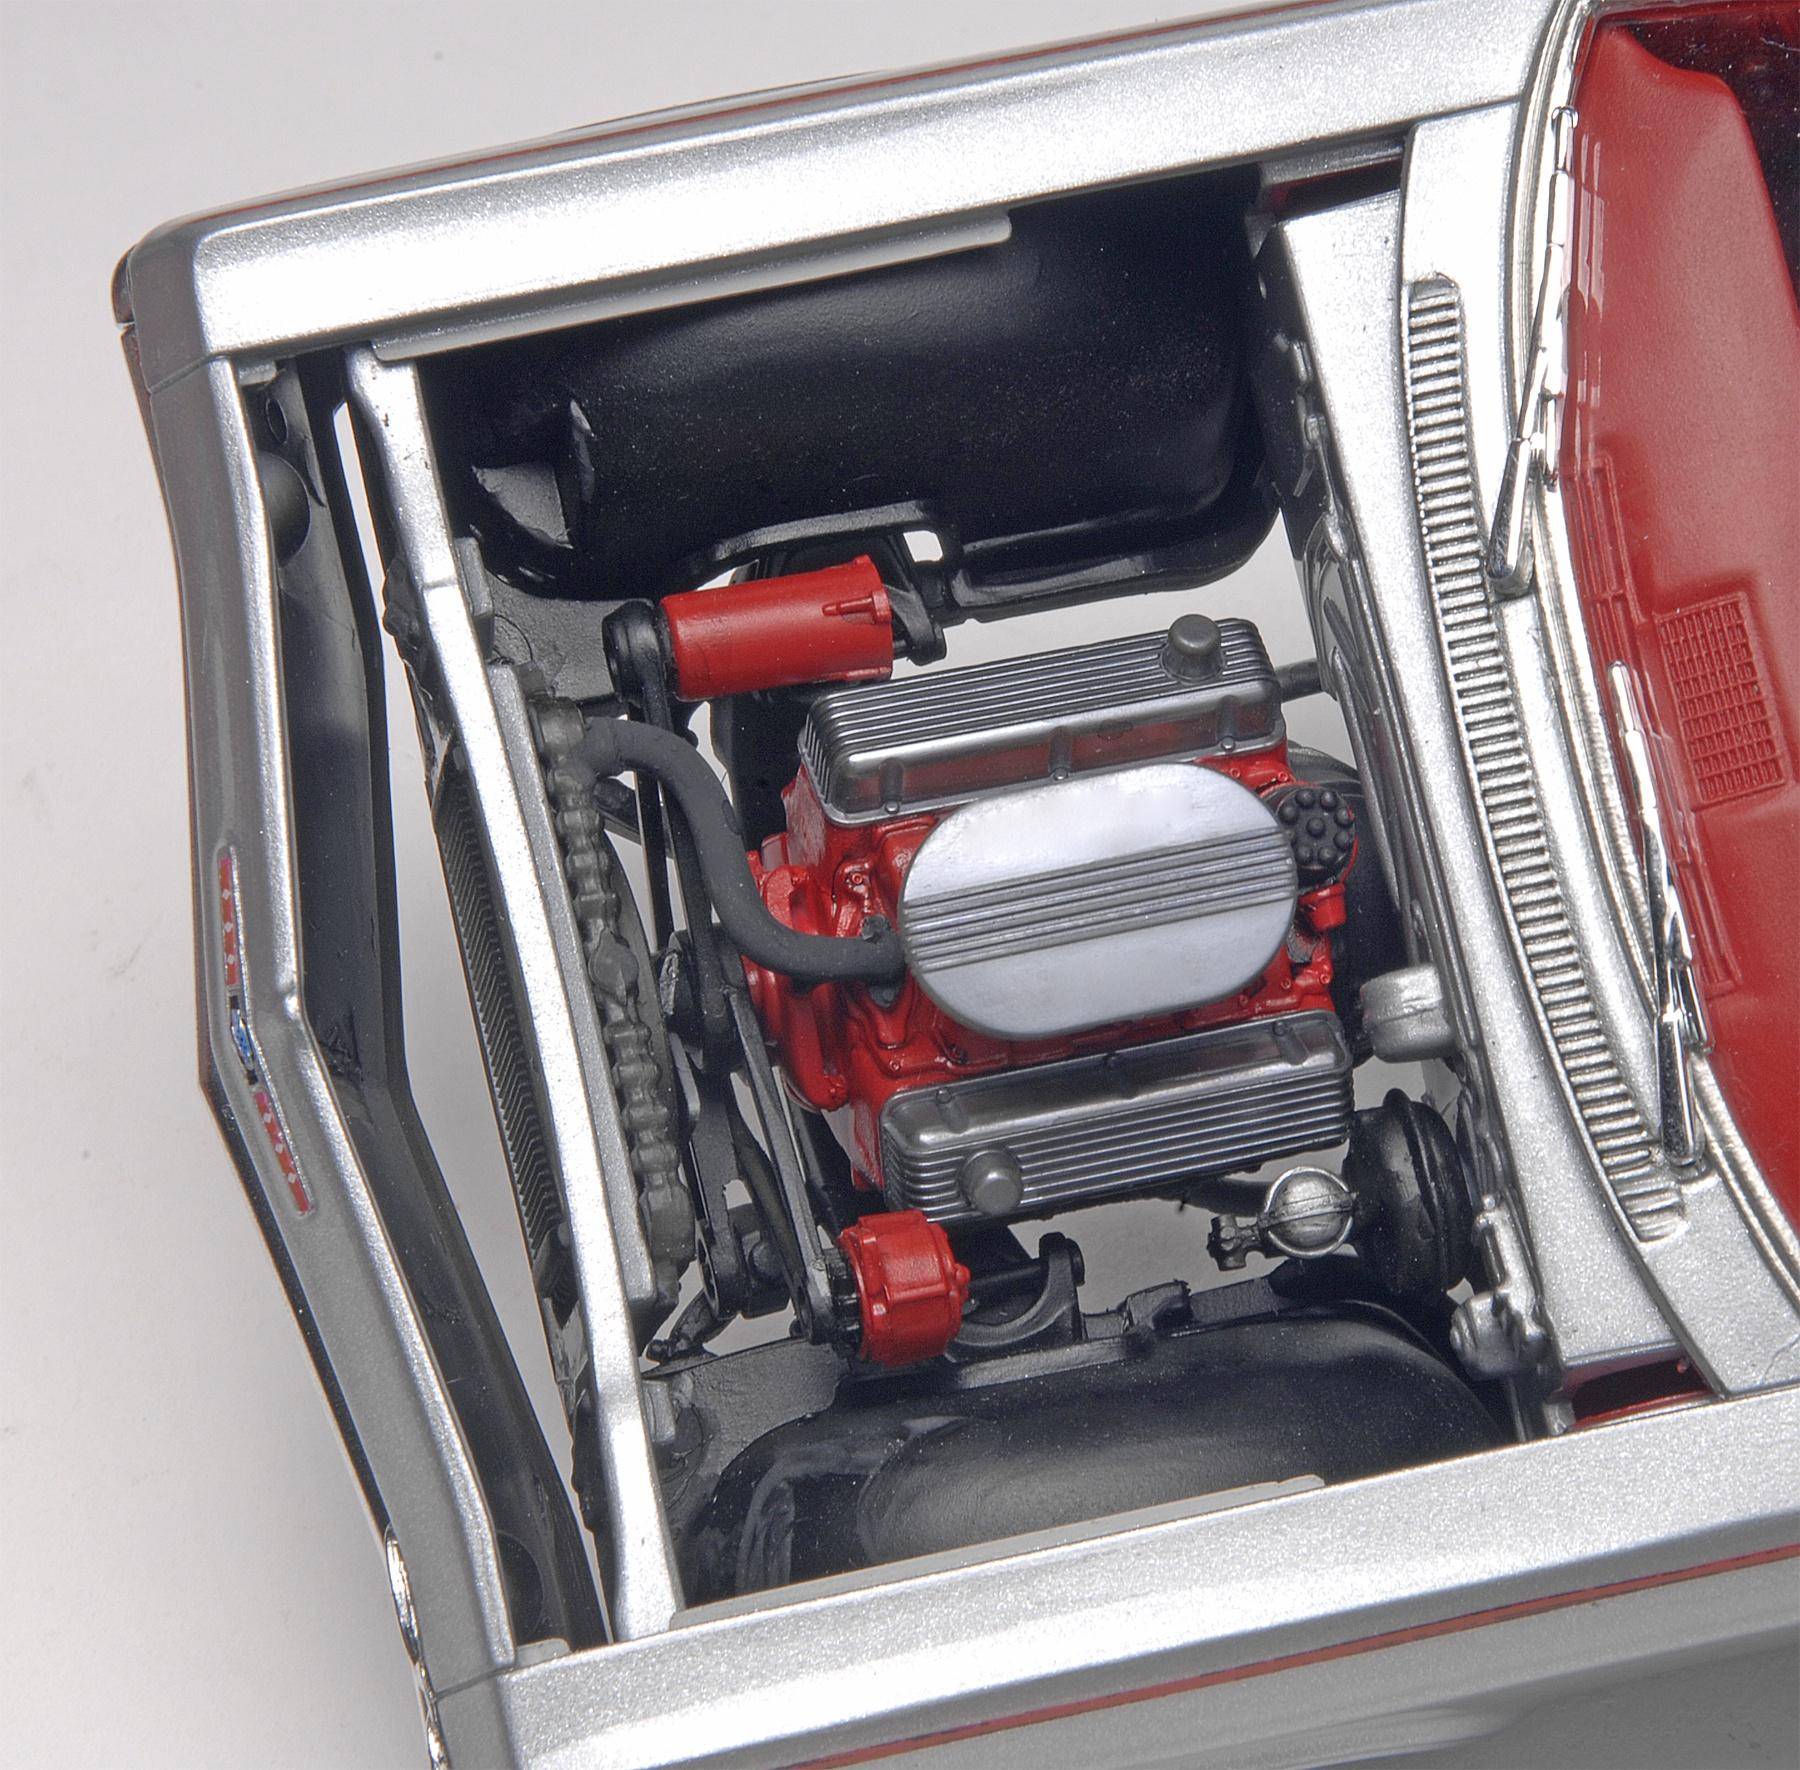 Plastic Model Kit-'65 Chevy Impala 1:25